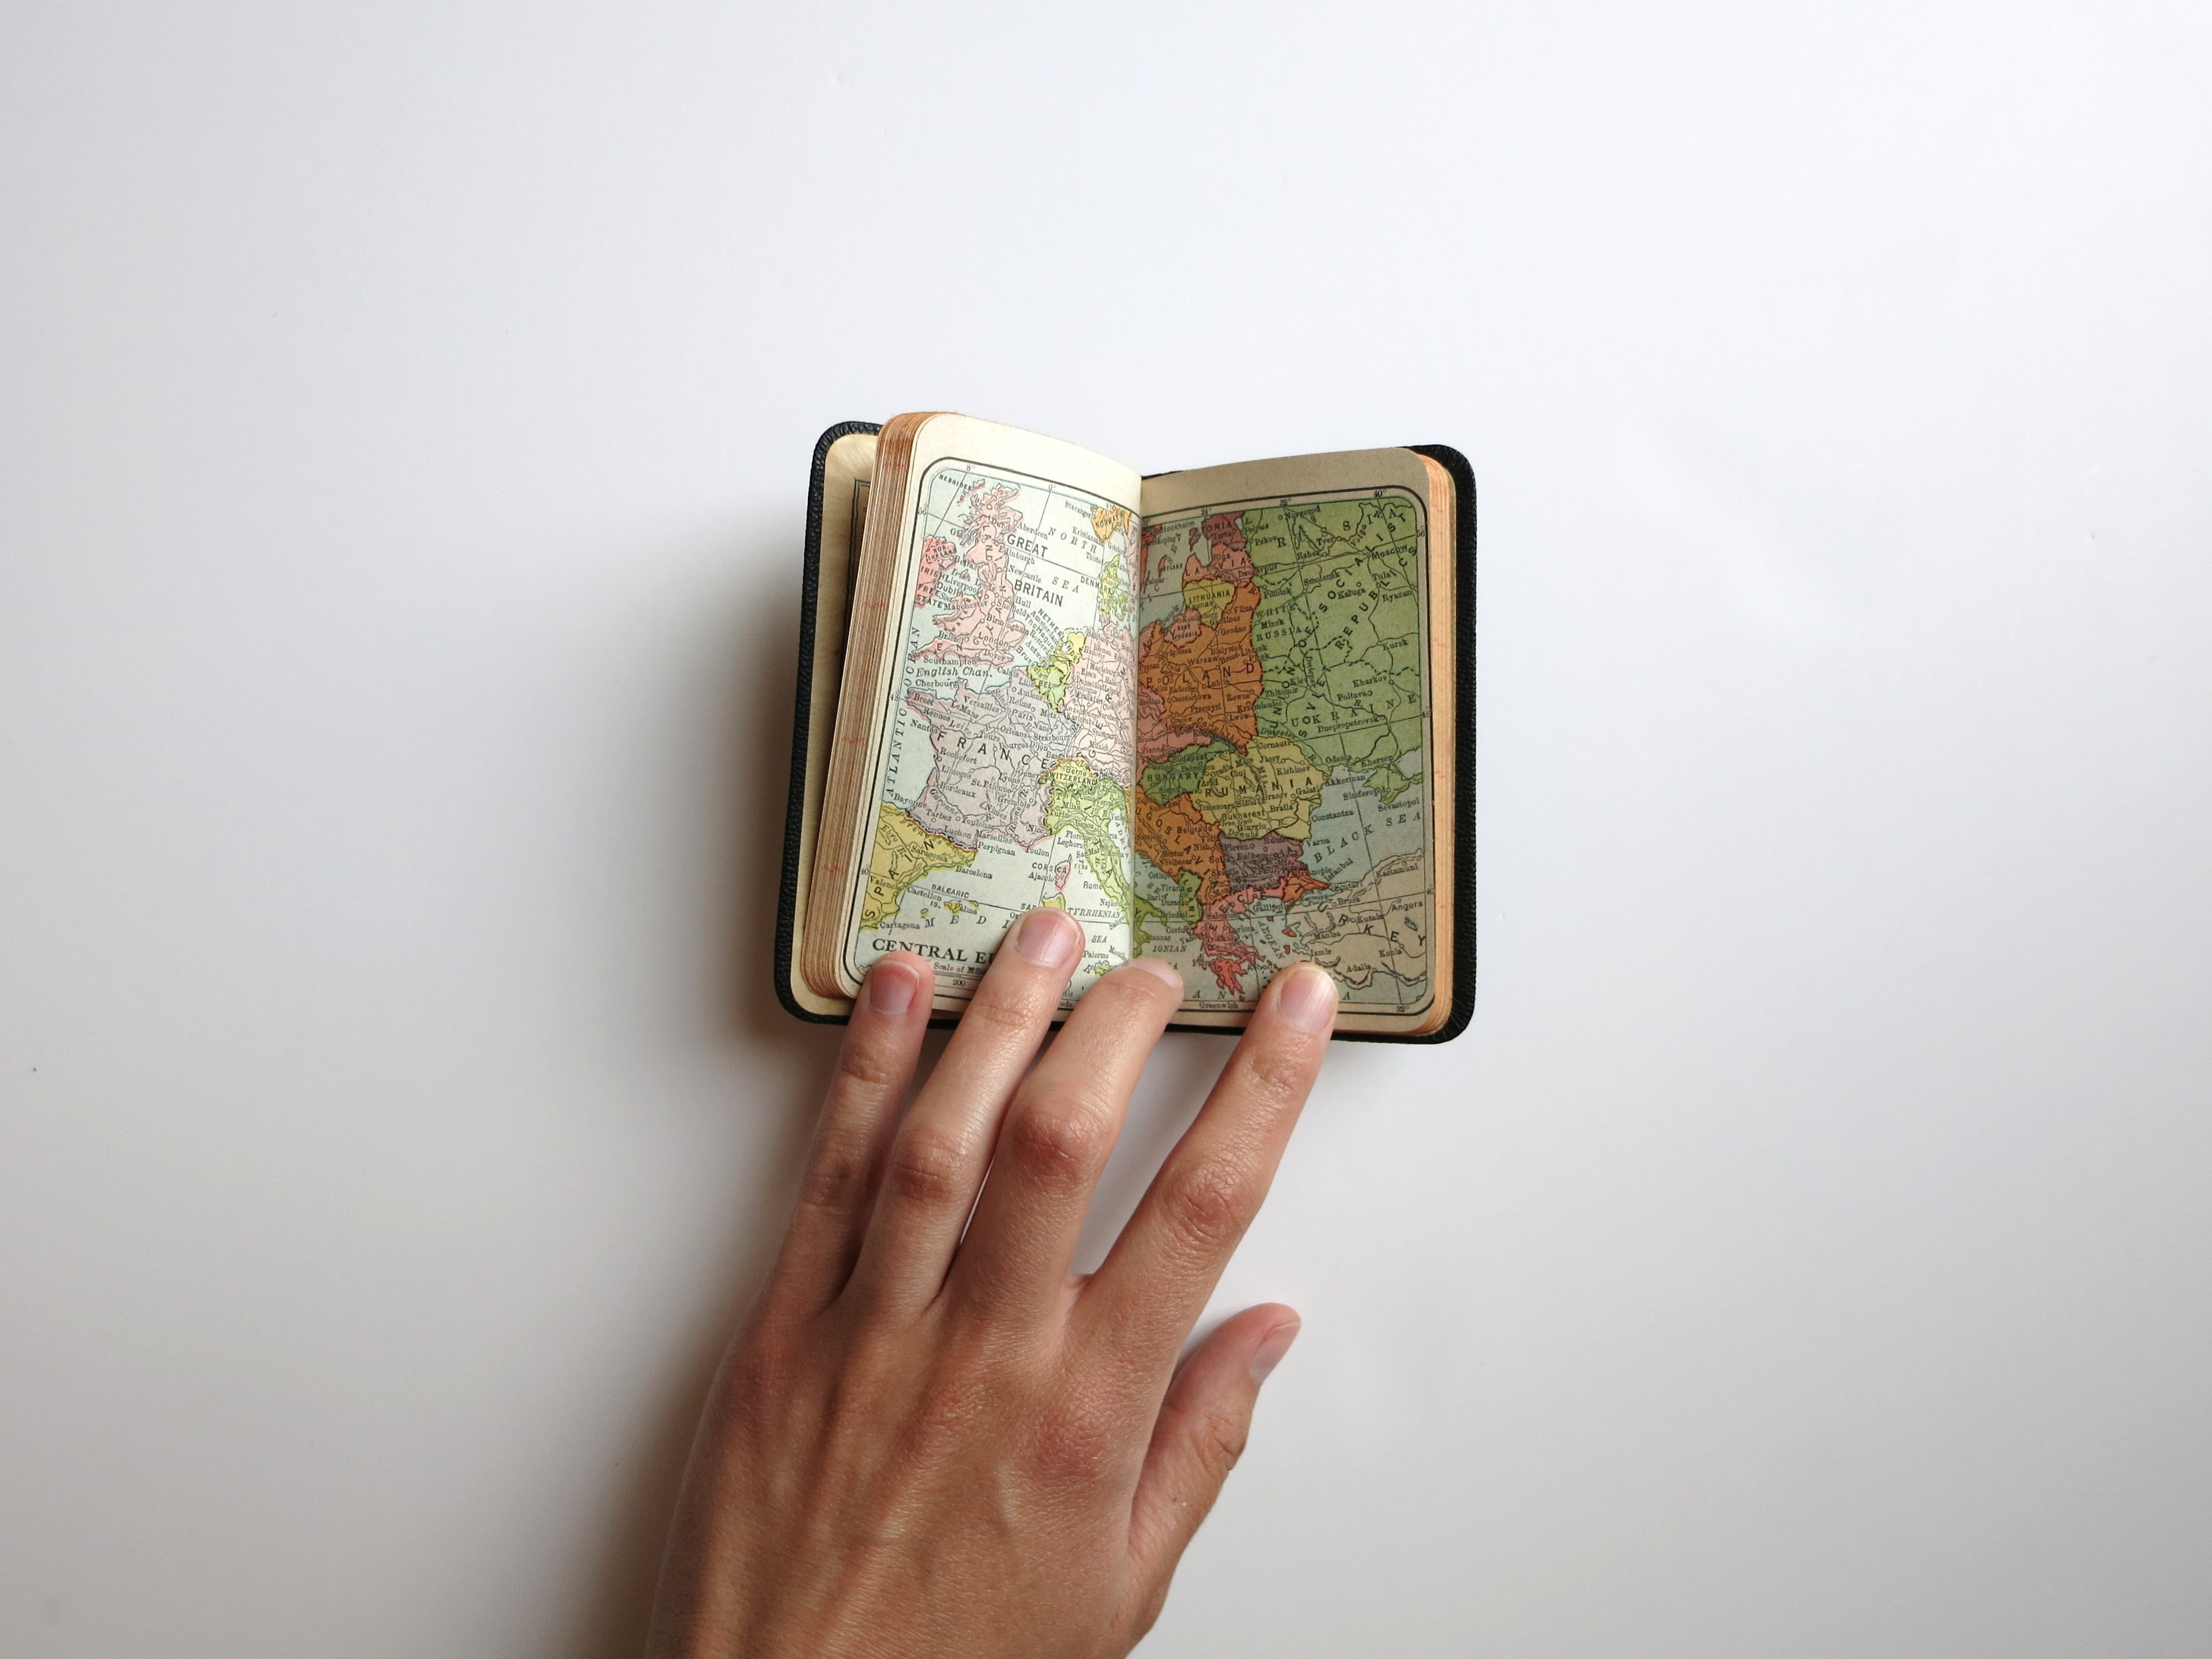 word-map-hand-travel-90bb975b7ae6b088f2125685d97d9911